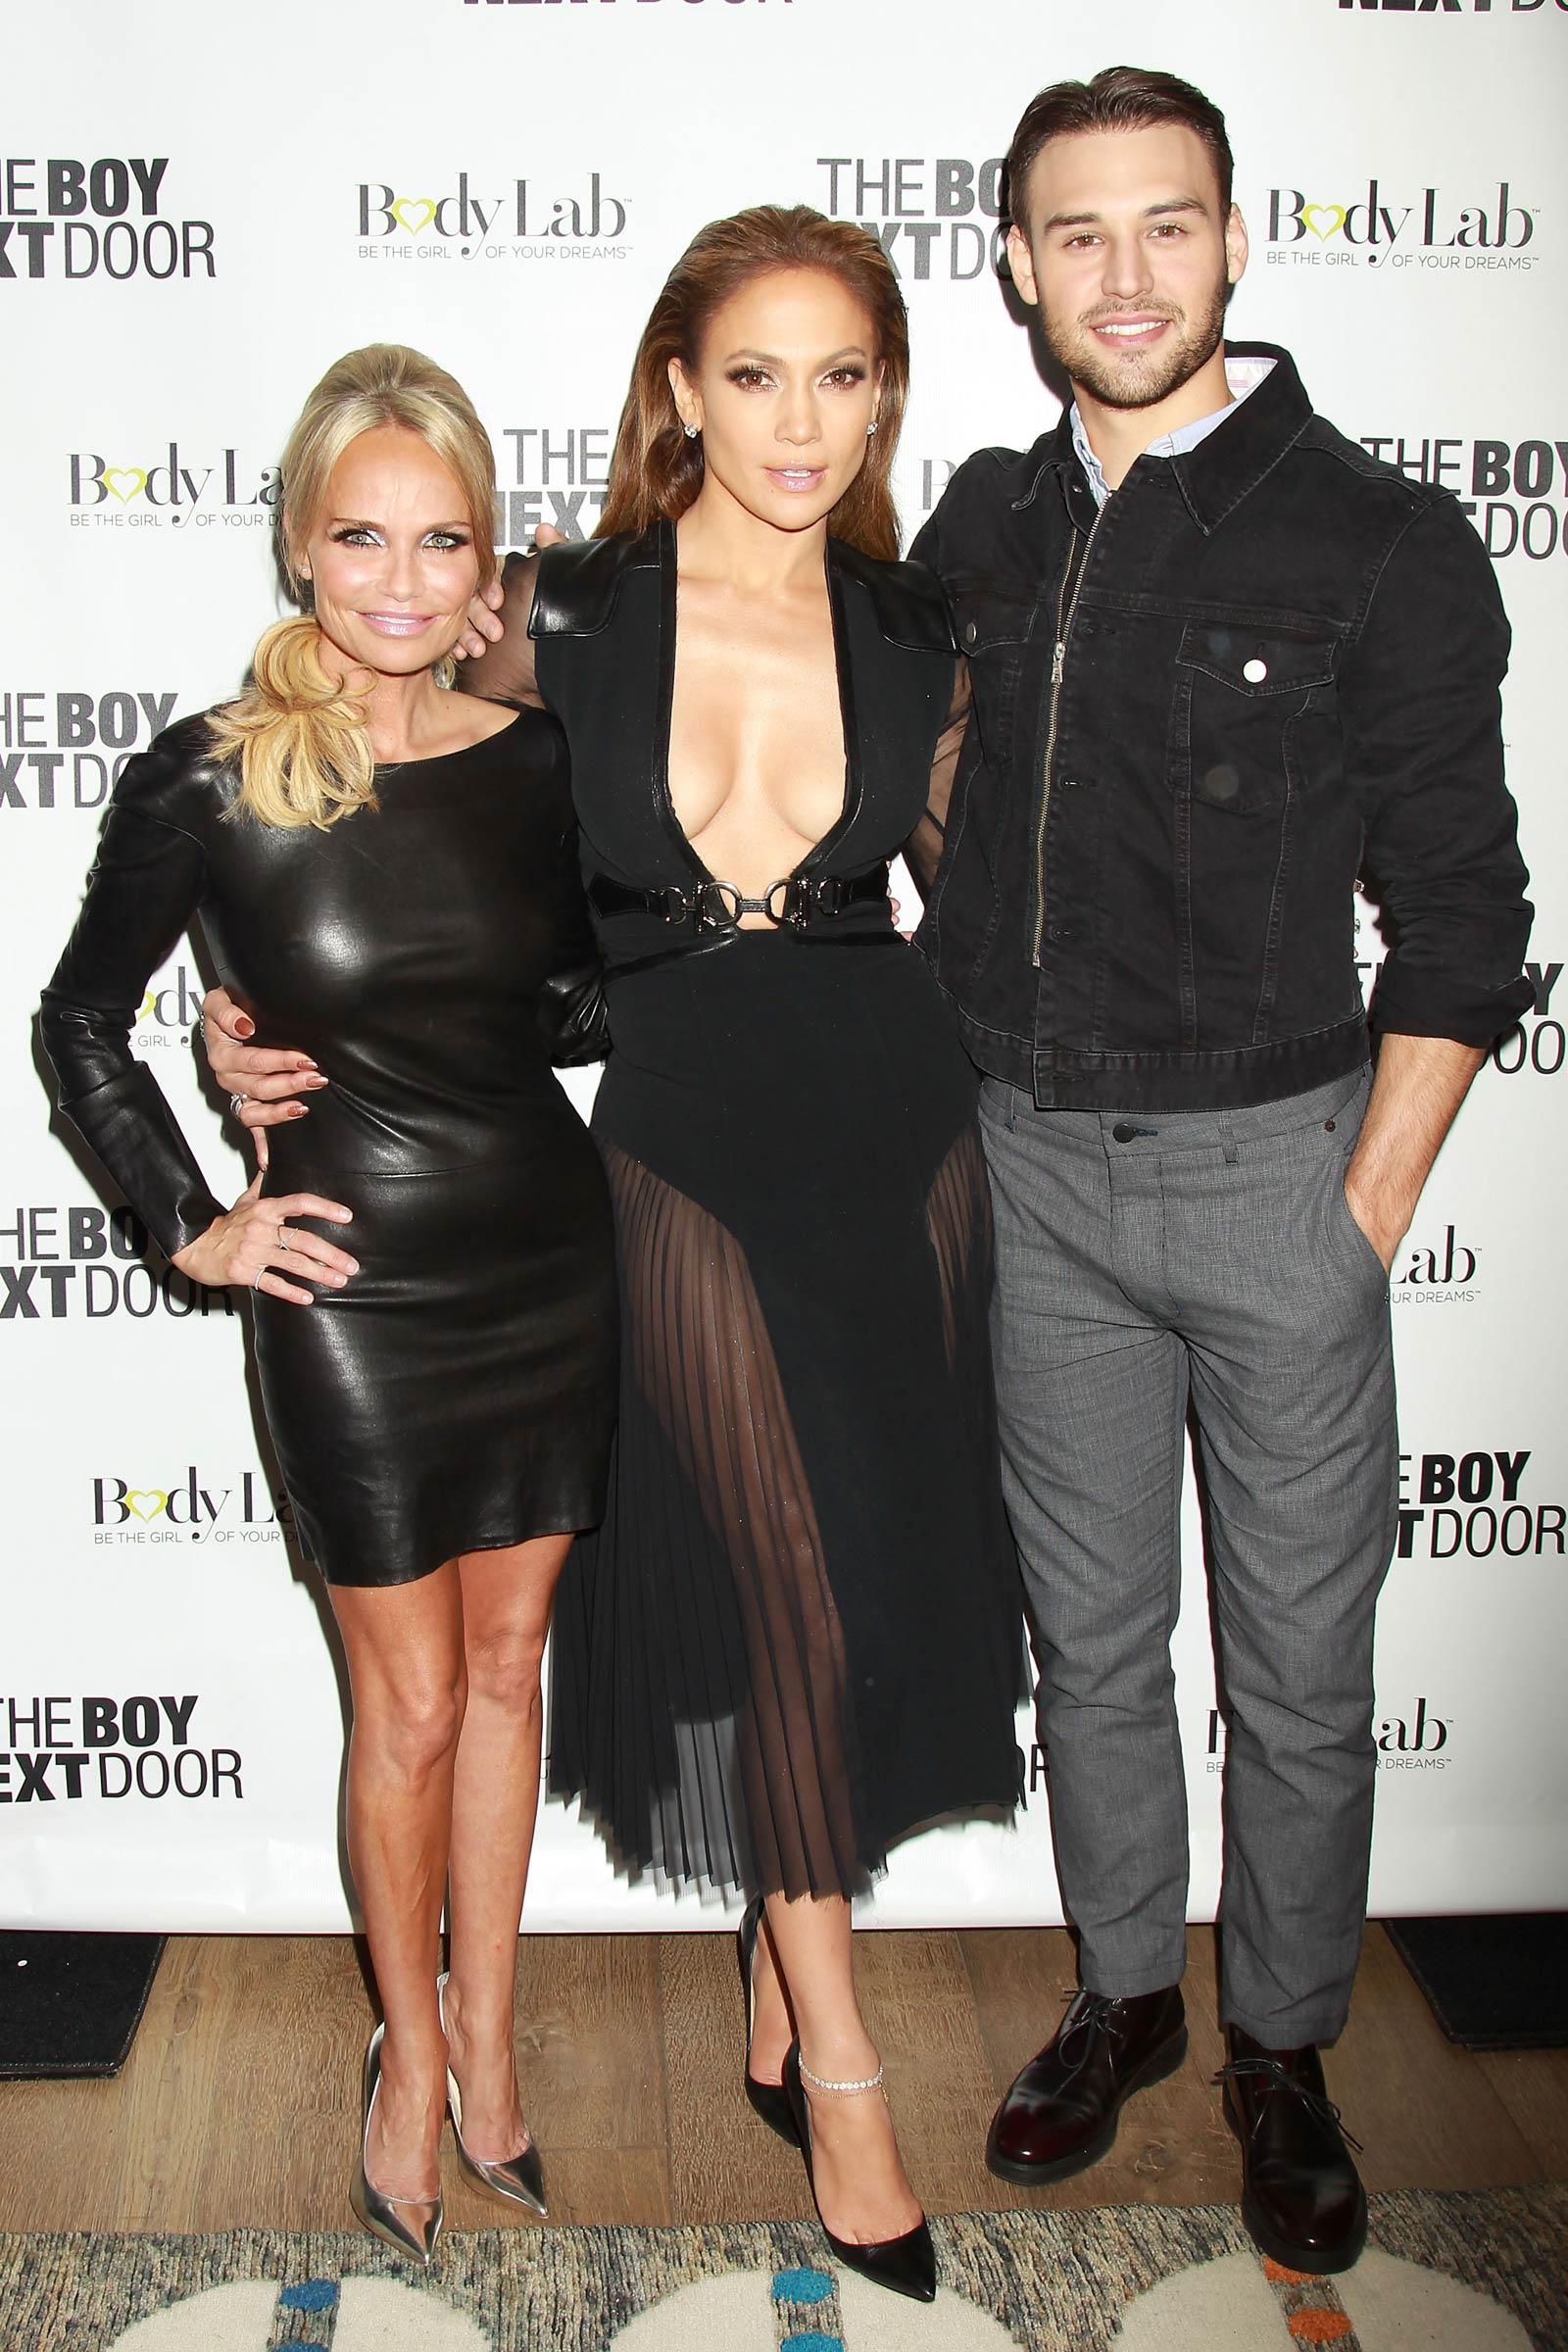 Kristin Chenoweth attends screening of The Boy Next Door